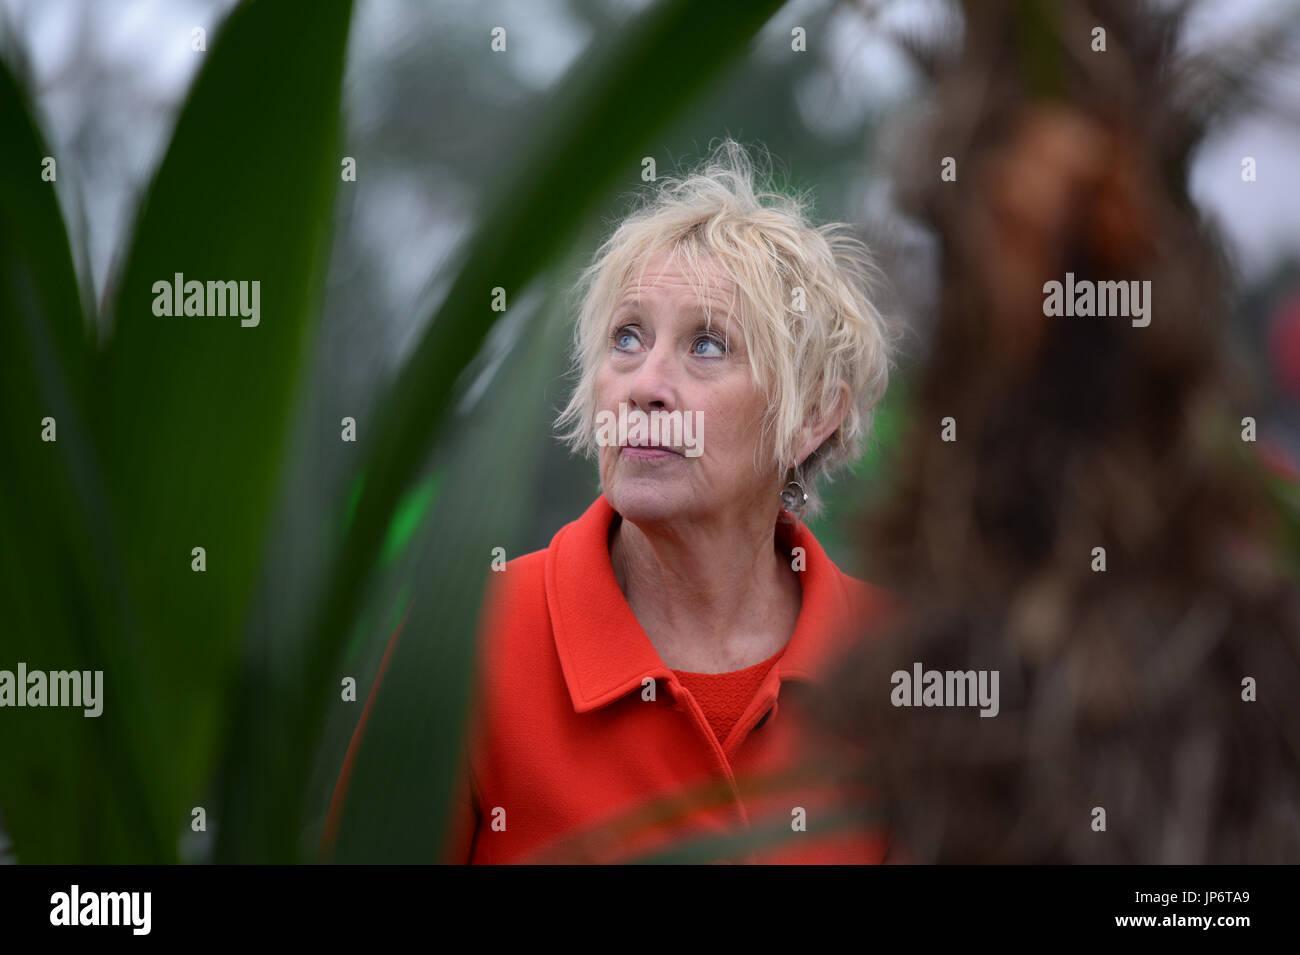 Presenter tv programme stock photos presenter tv for Gardening programmes on tv